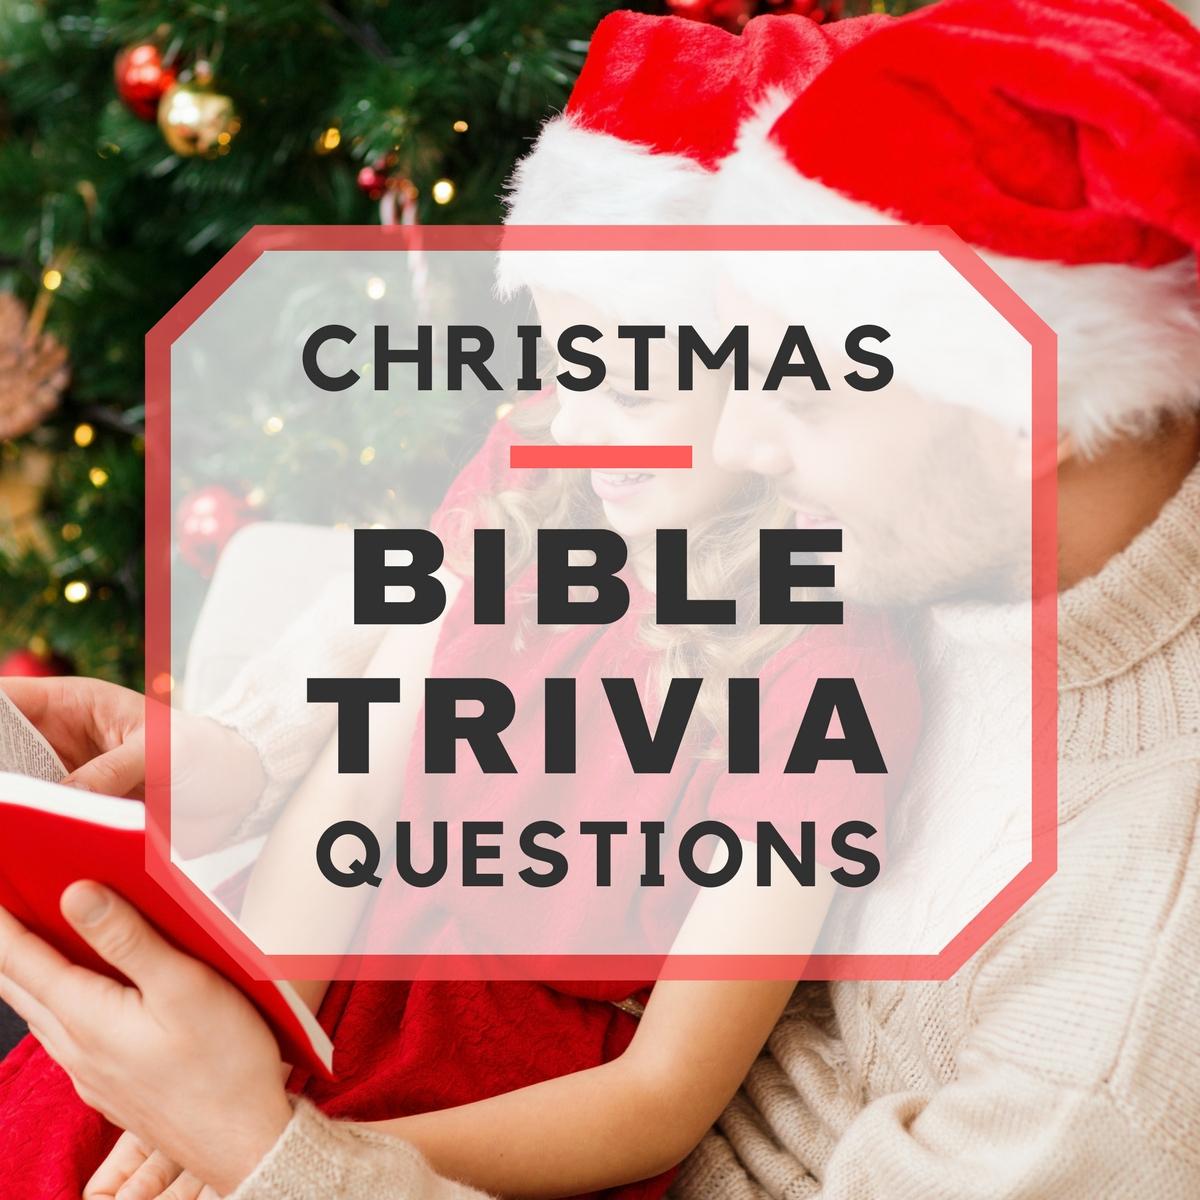 20 Fun Christmas Bible Trivia Questions - Free Printable Bible Trivia Questions And Answers